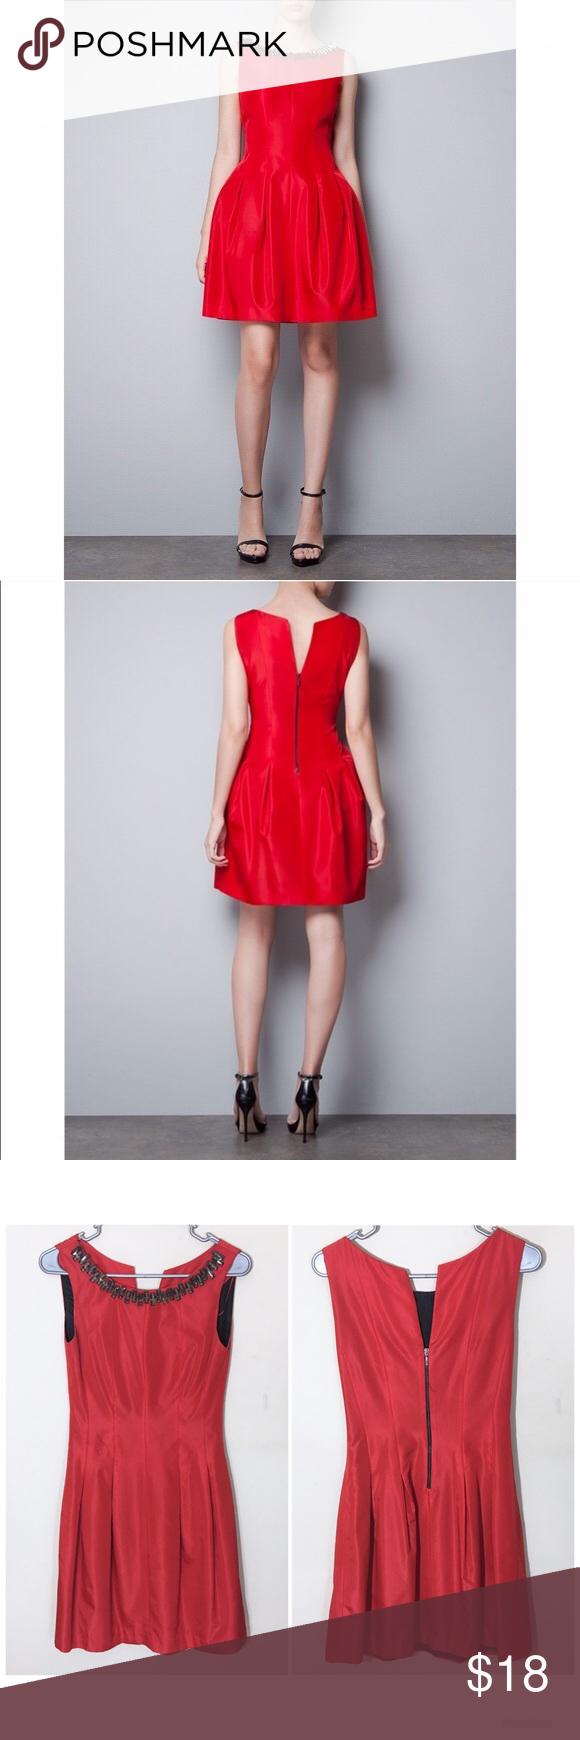 Zara embellished neckline red flare dress xs pinterest red flare